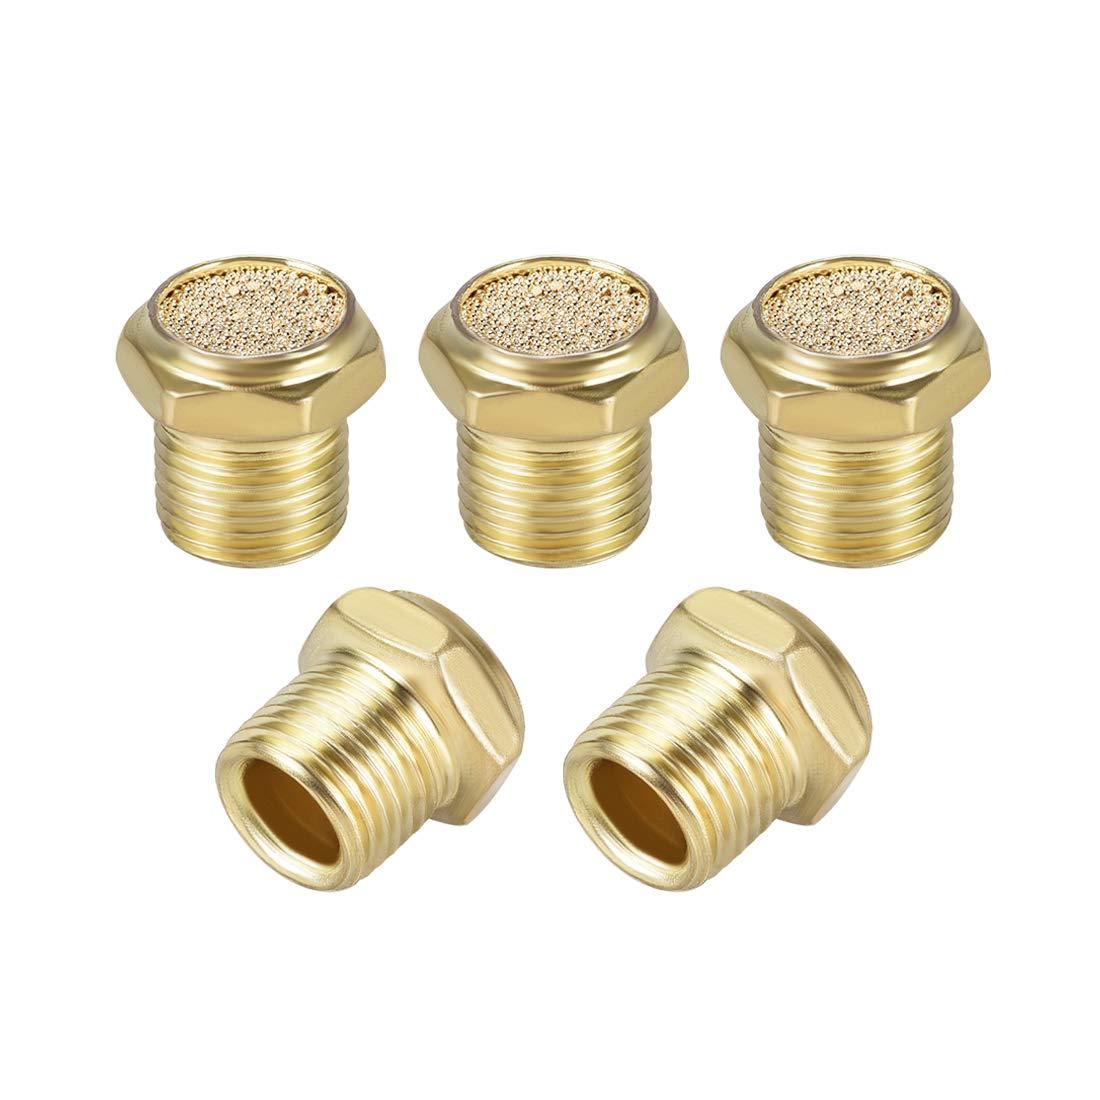 uxcell Sintered Bronze Exhaust Muffler G1 Flat Brass Popular brand in the world 8 - Pn Philadelphia Mall Body